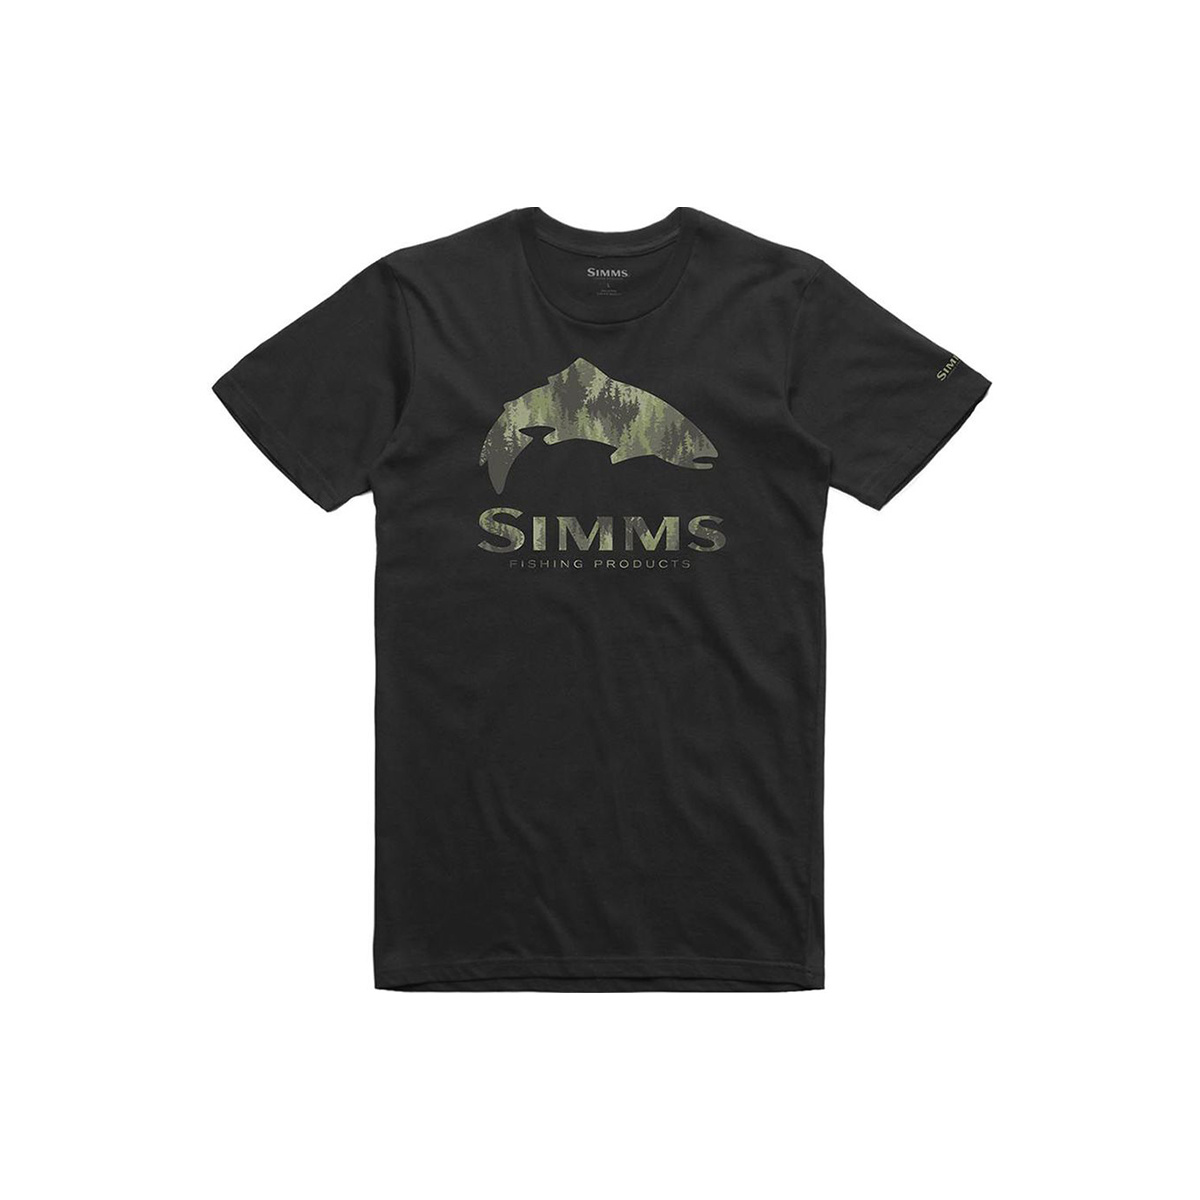 Simms Clothing Men's Trout Pine Camo T-Shirt